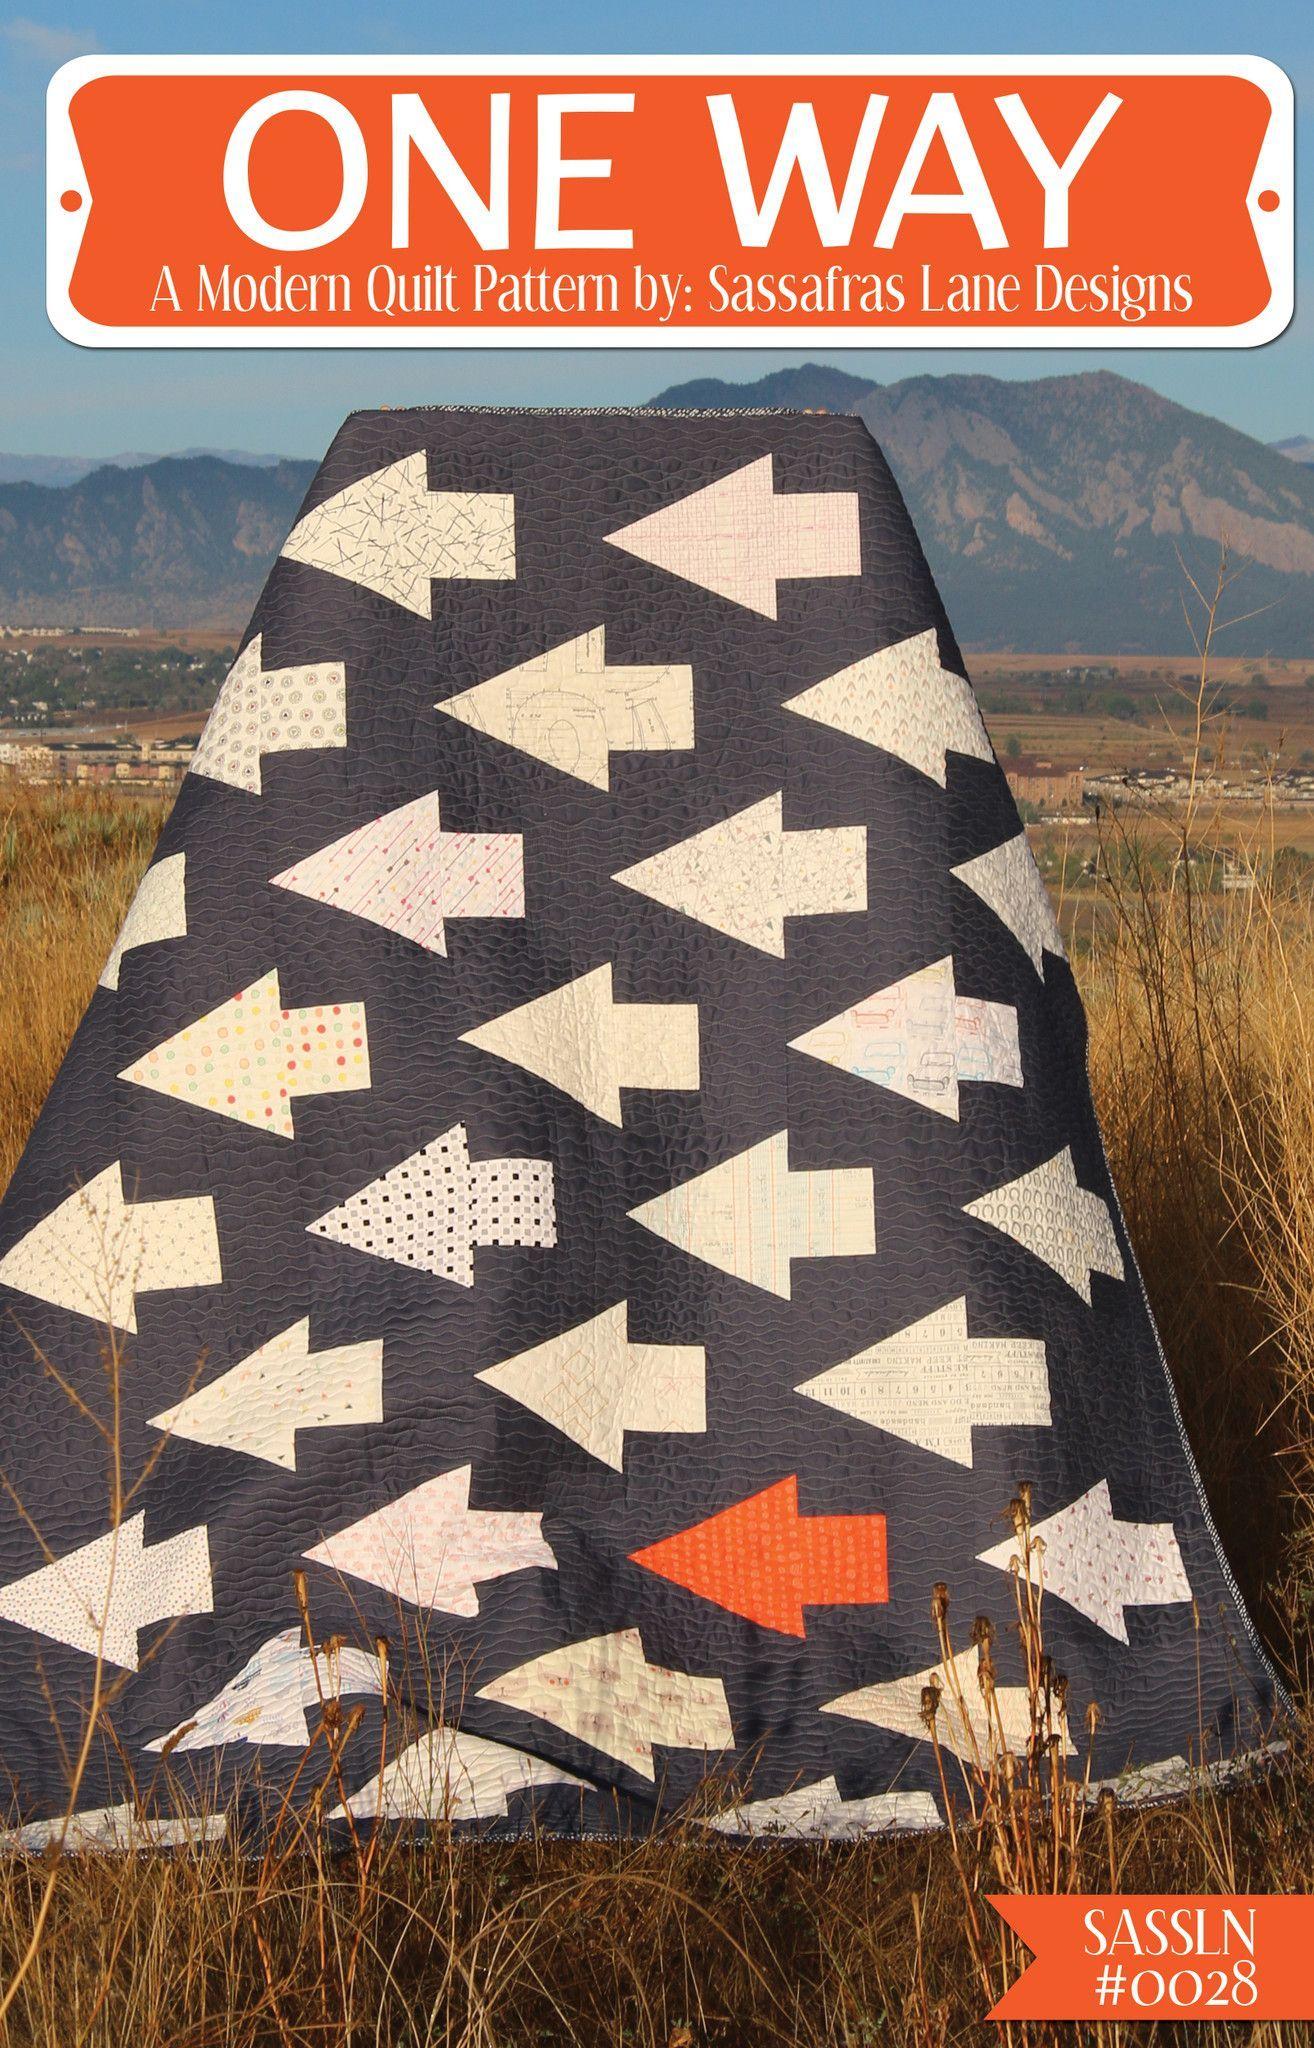 One way quilt pattern quilts modern quilt patterns